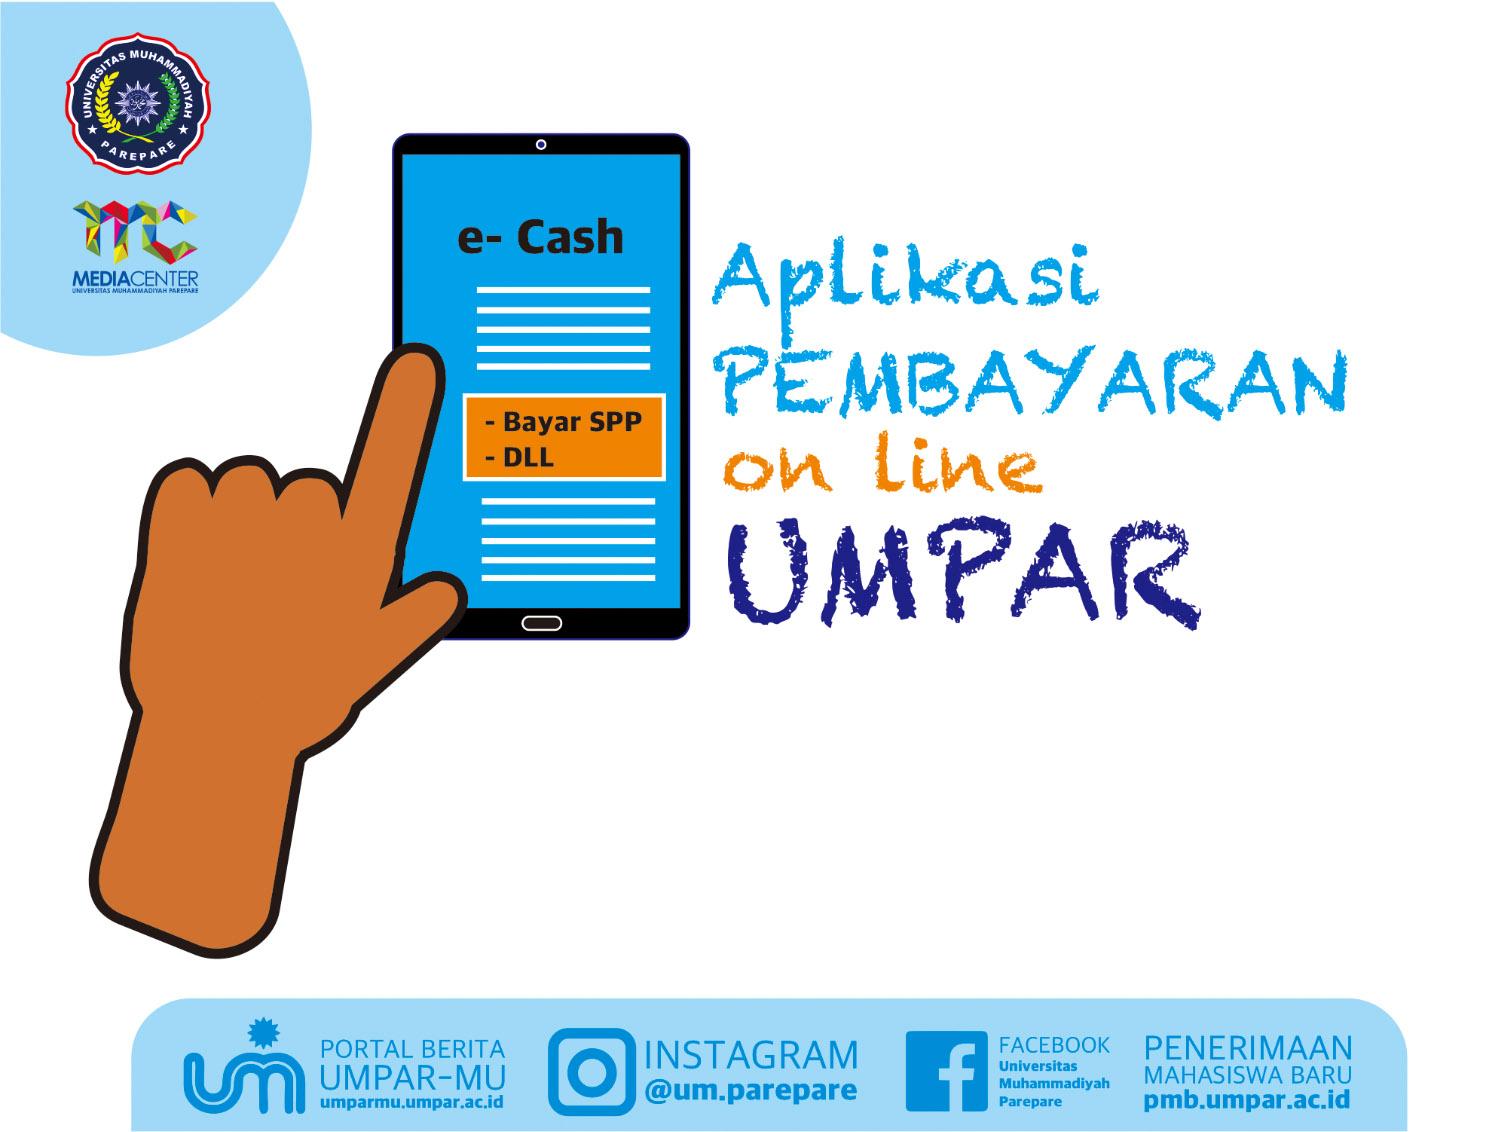 foto_berita/bayar-biaya-kuliah-dengan-e-cash-umpar-berikut-langkah-dan-video-tutorialnya.jpg